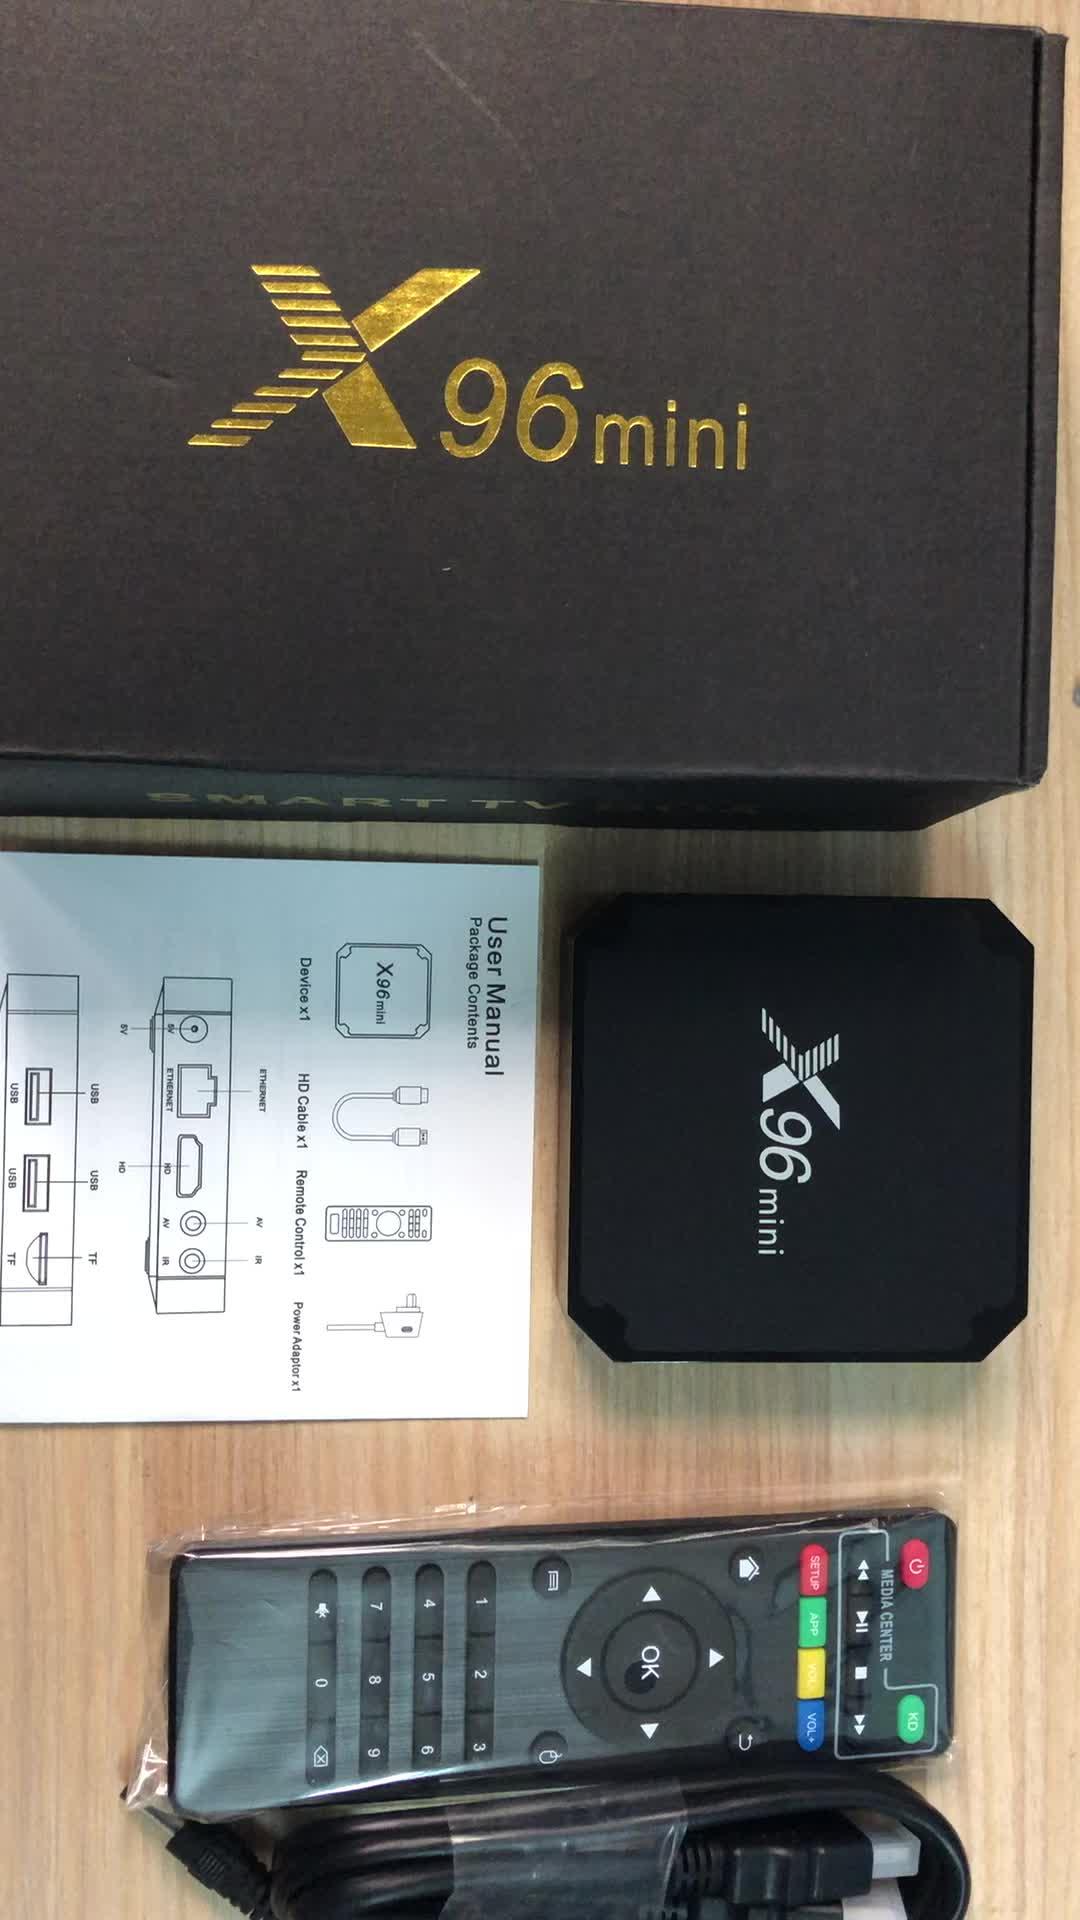 ТВ-приставка X96 Mini S905W, Android 7,1, 4 ядра, Wi-Fi, 4K